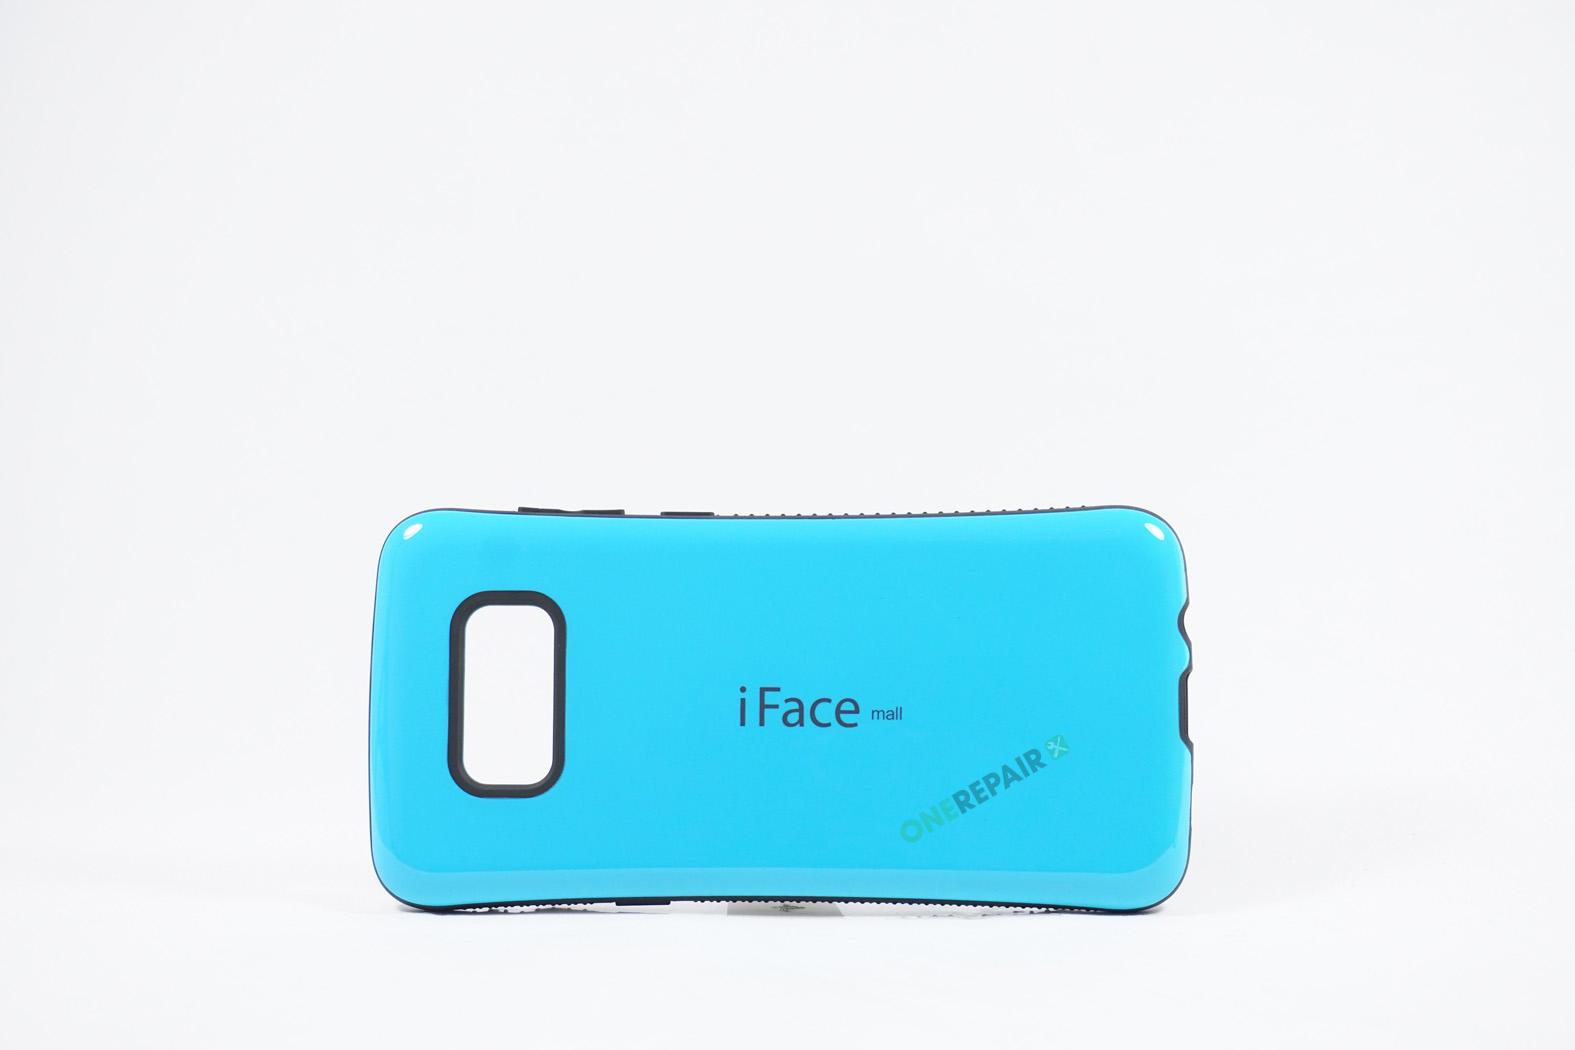 350697_Samsung_S8+_iFace_Cover_Haandværker_Blaa_OneRepair_00003